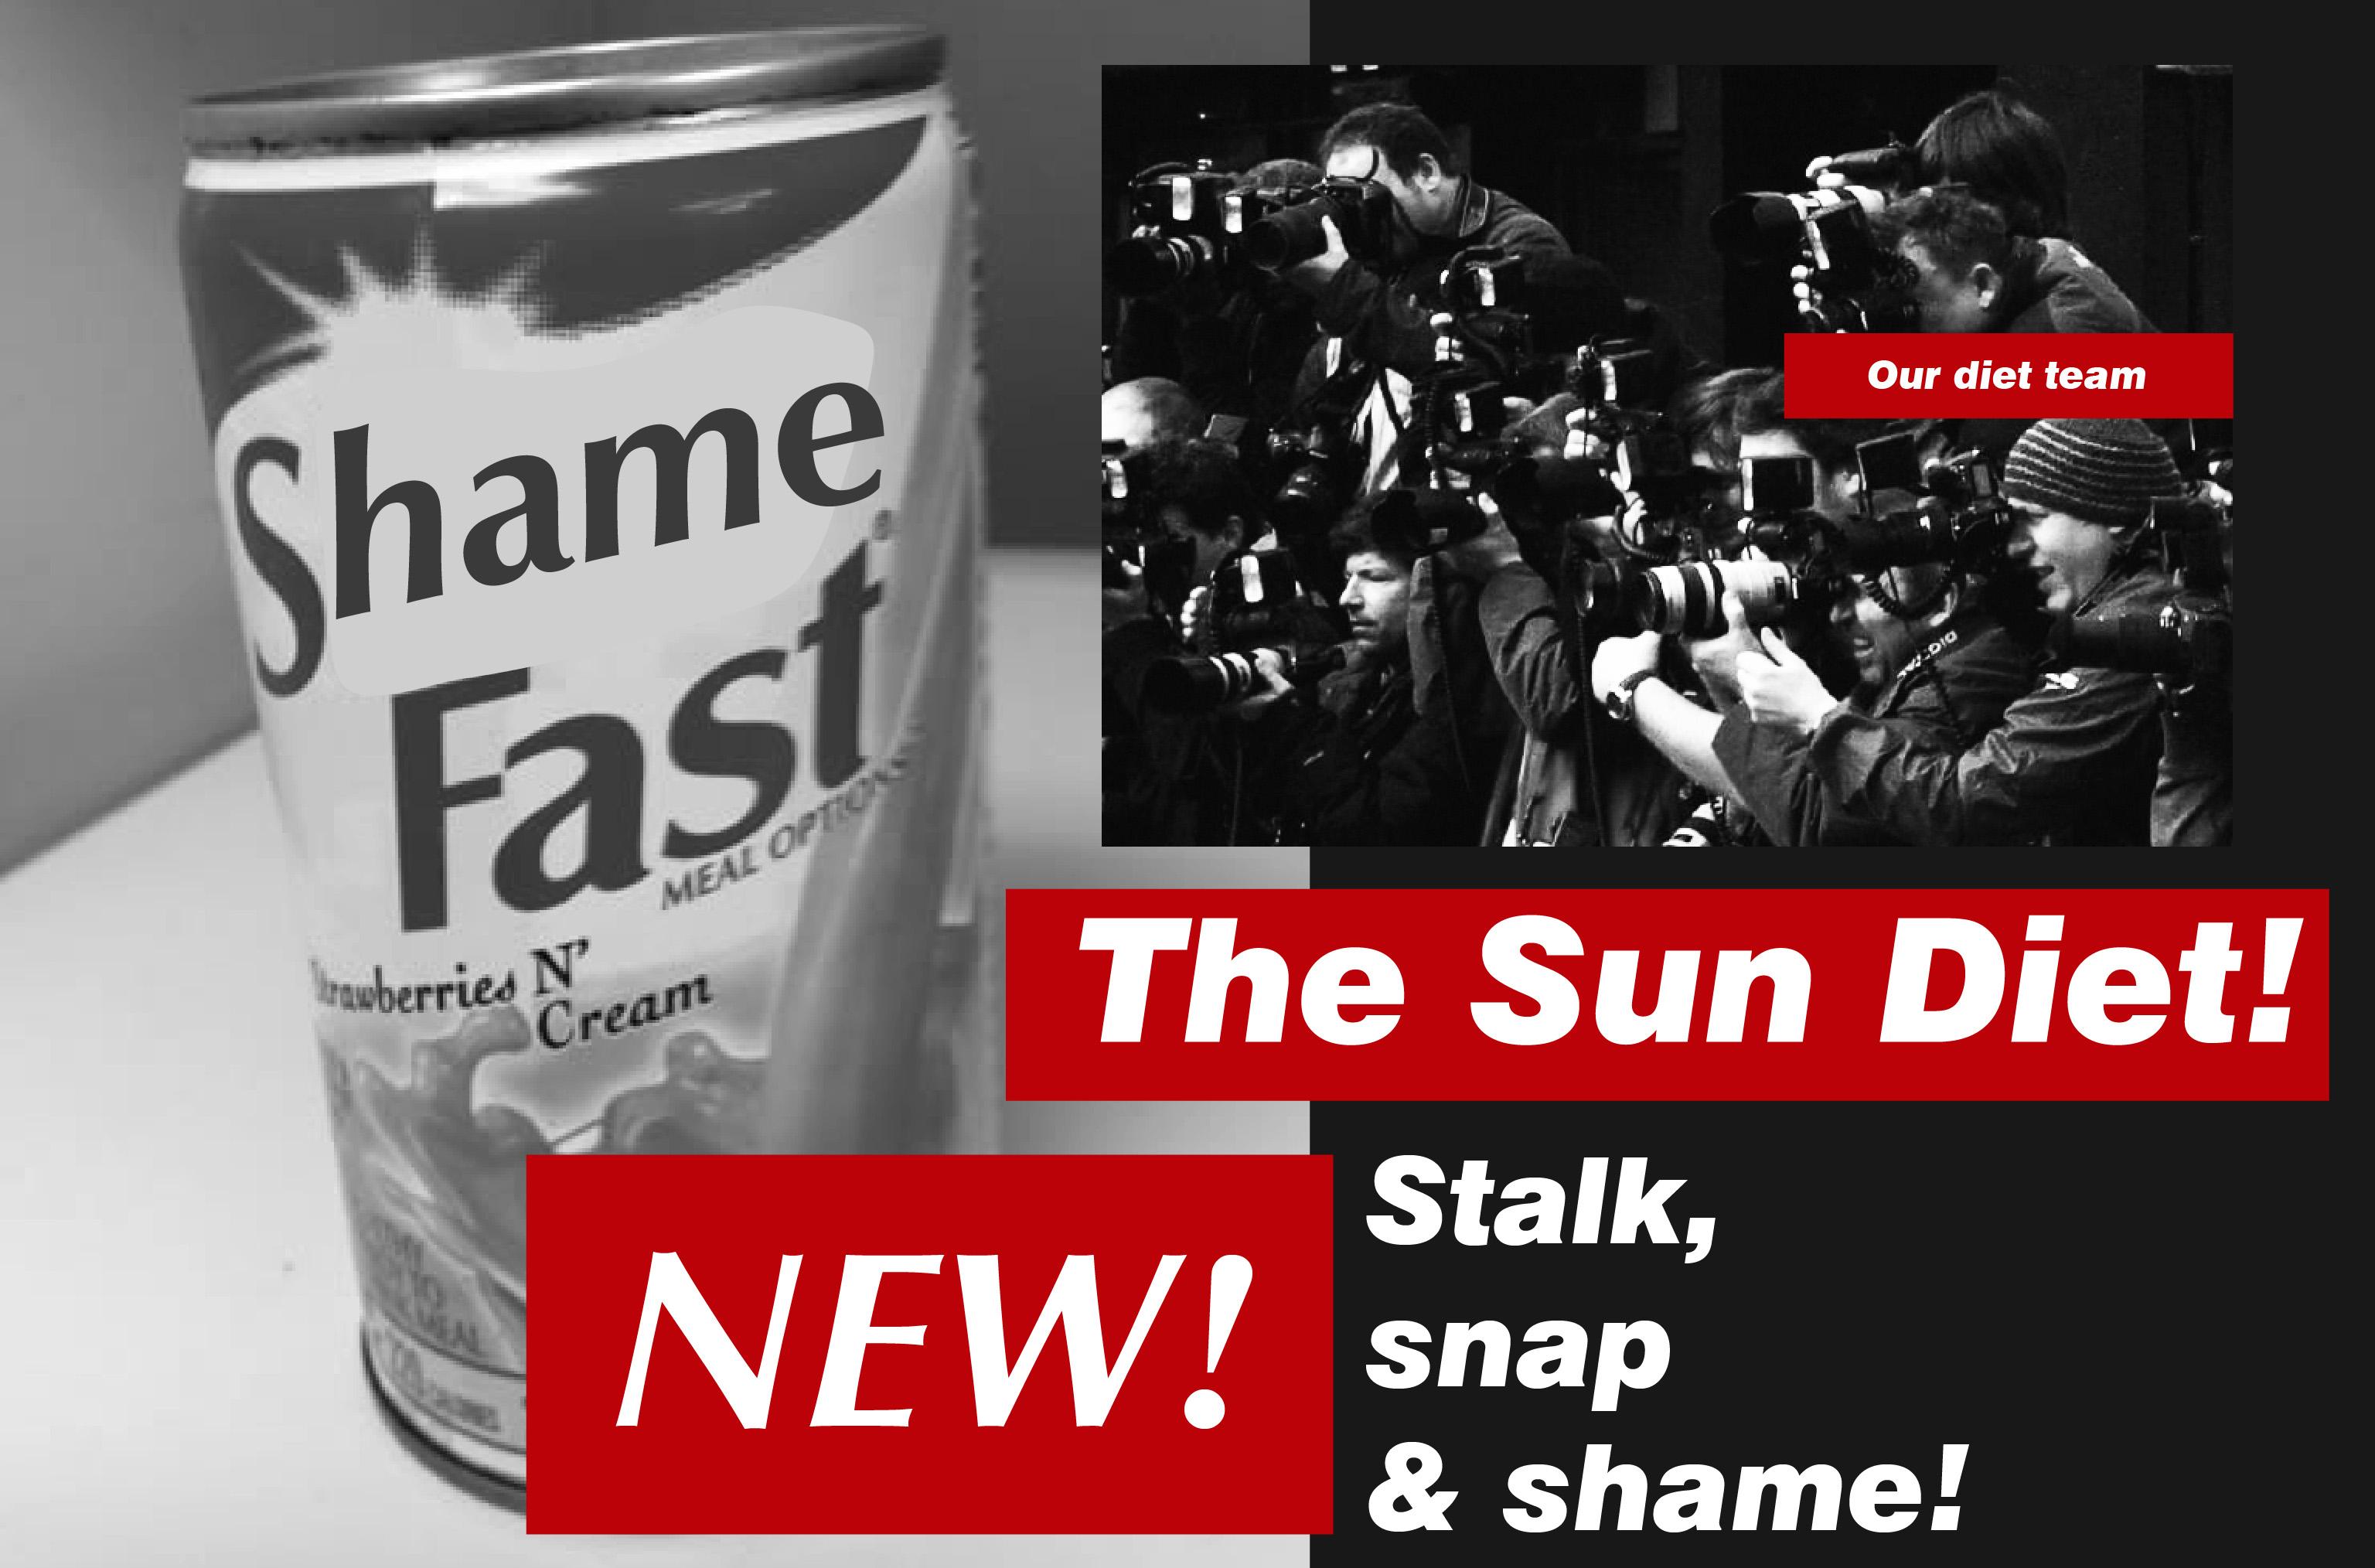 The Sun Diet